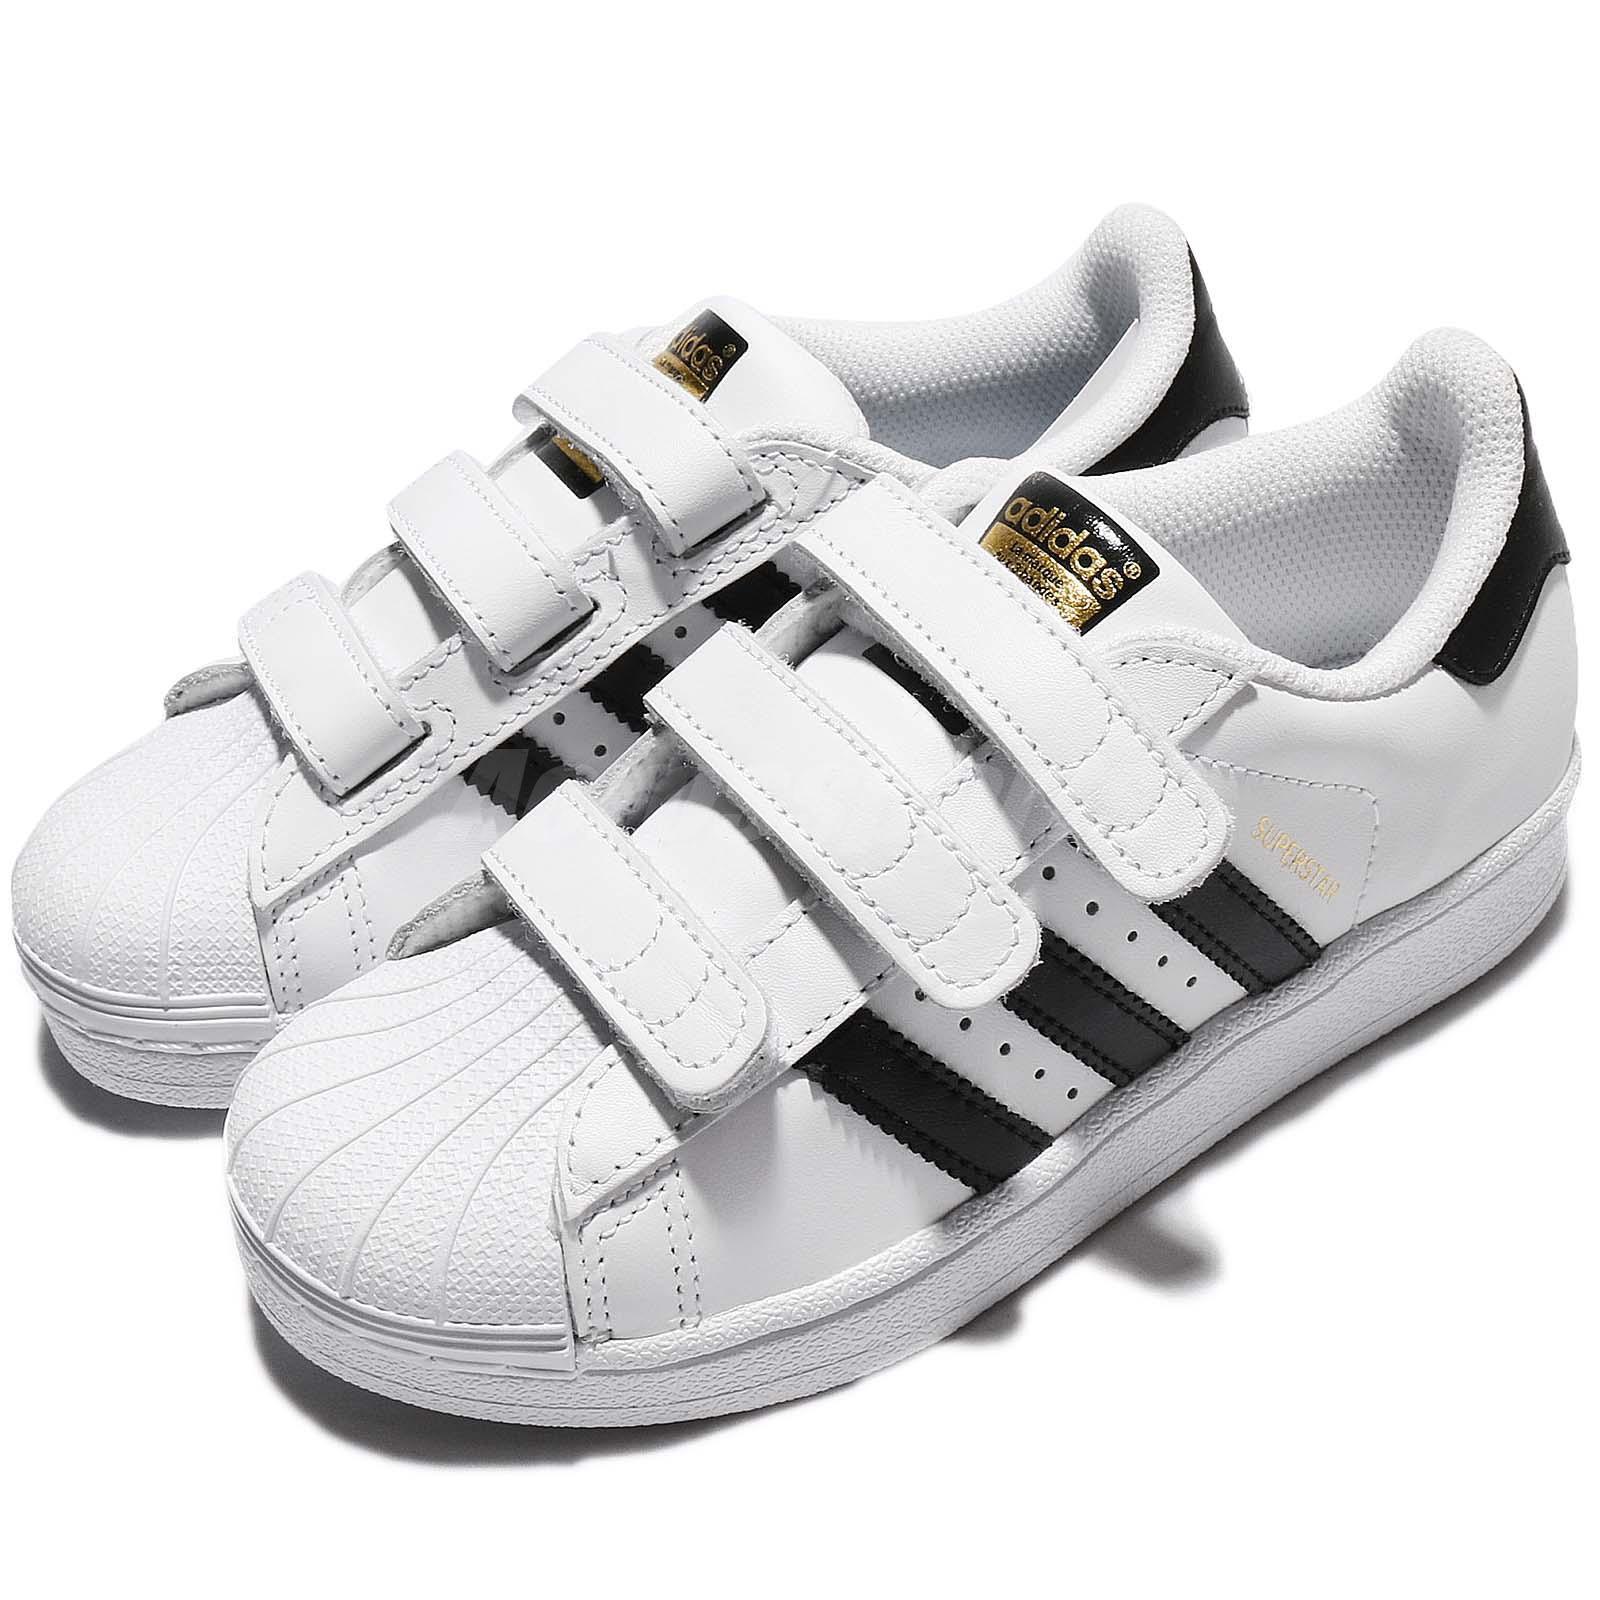 adidas Superstar Sneakers WhiteBlack B26070